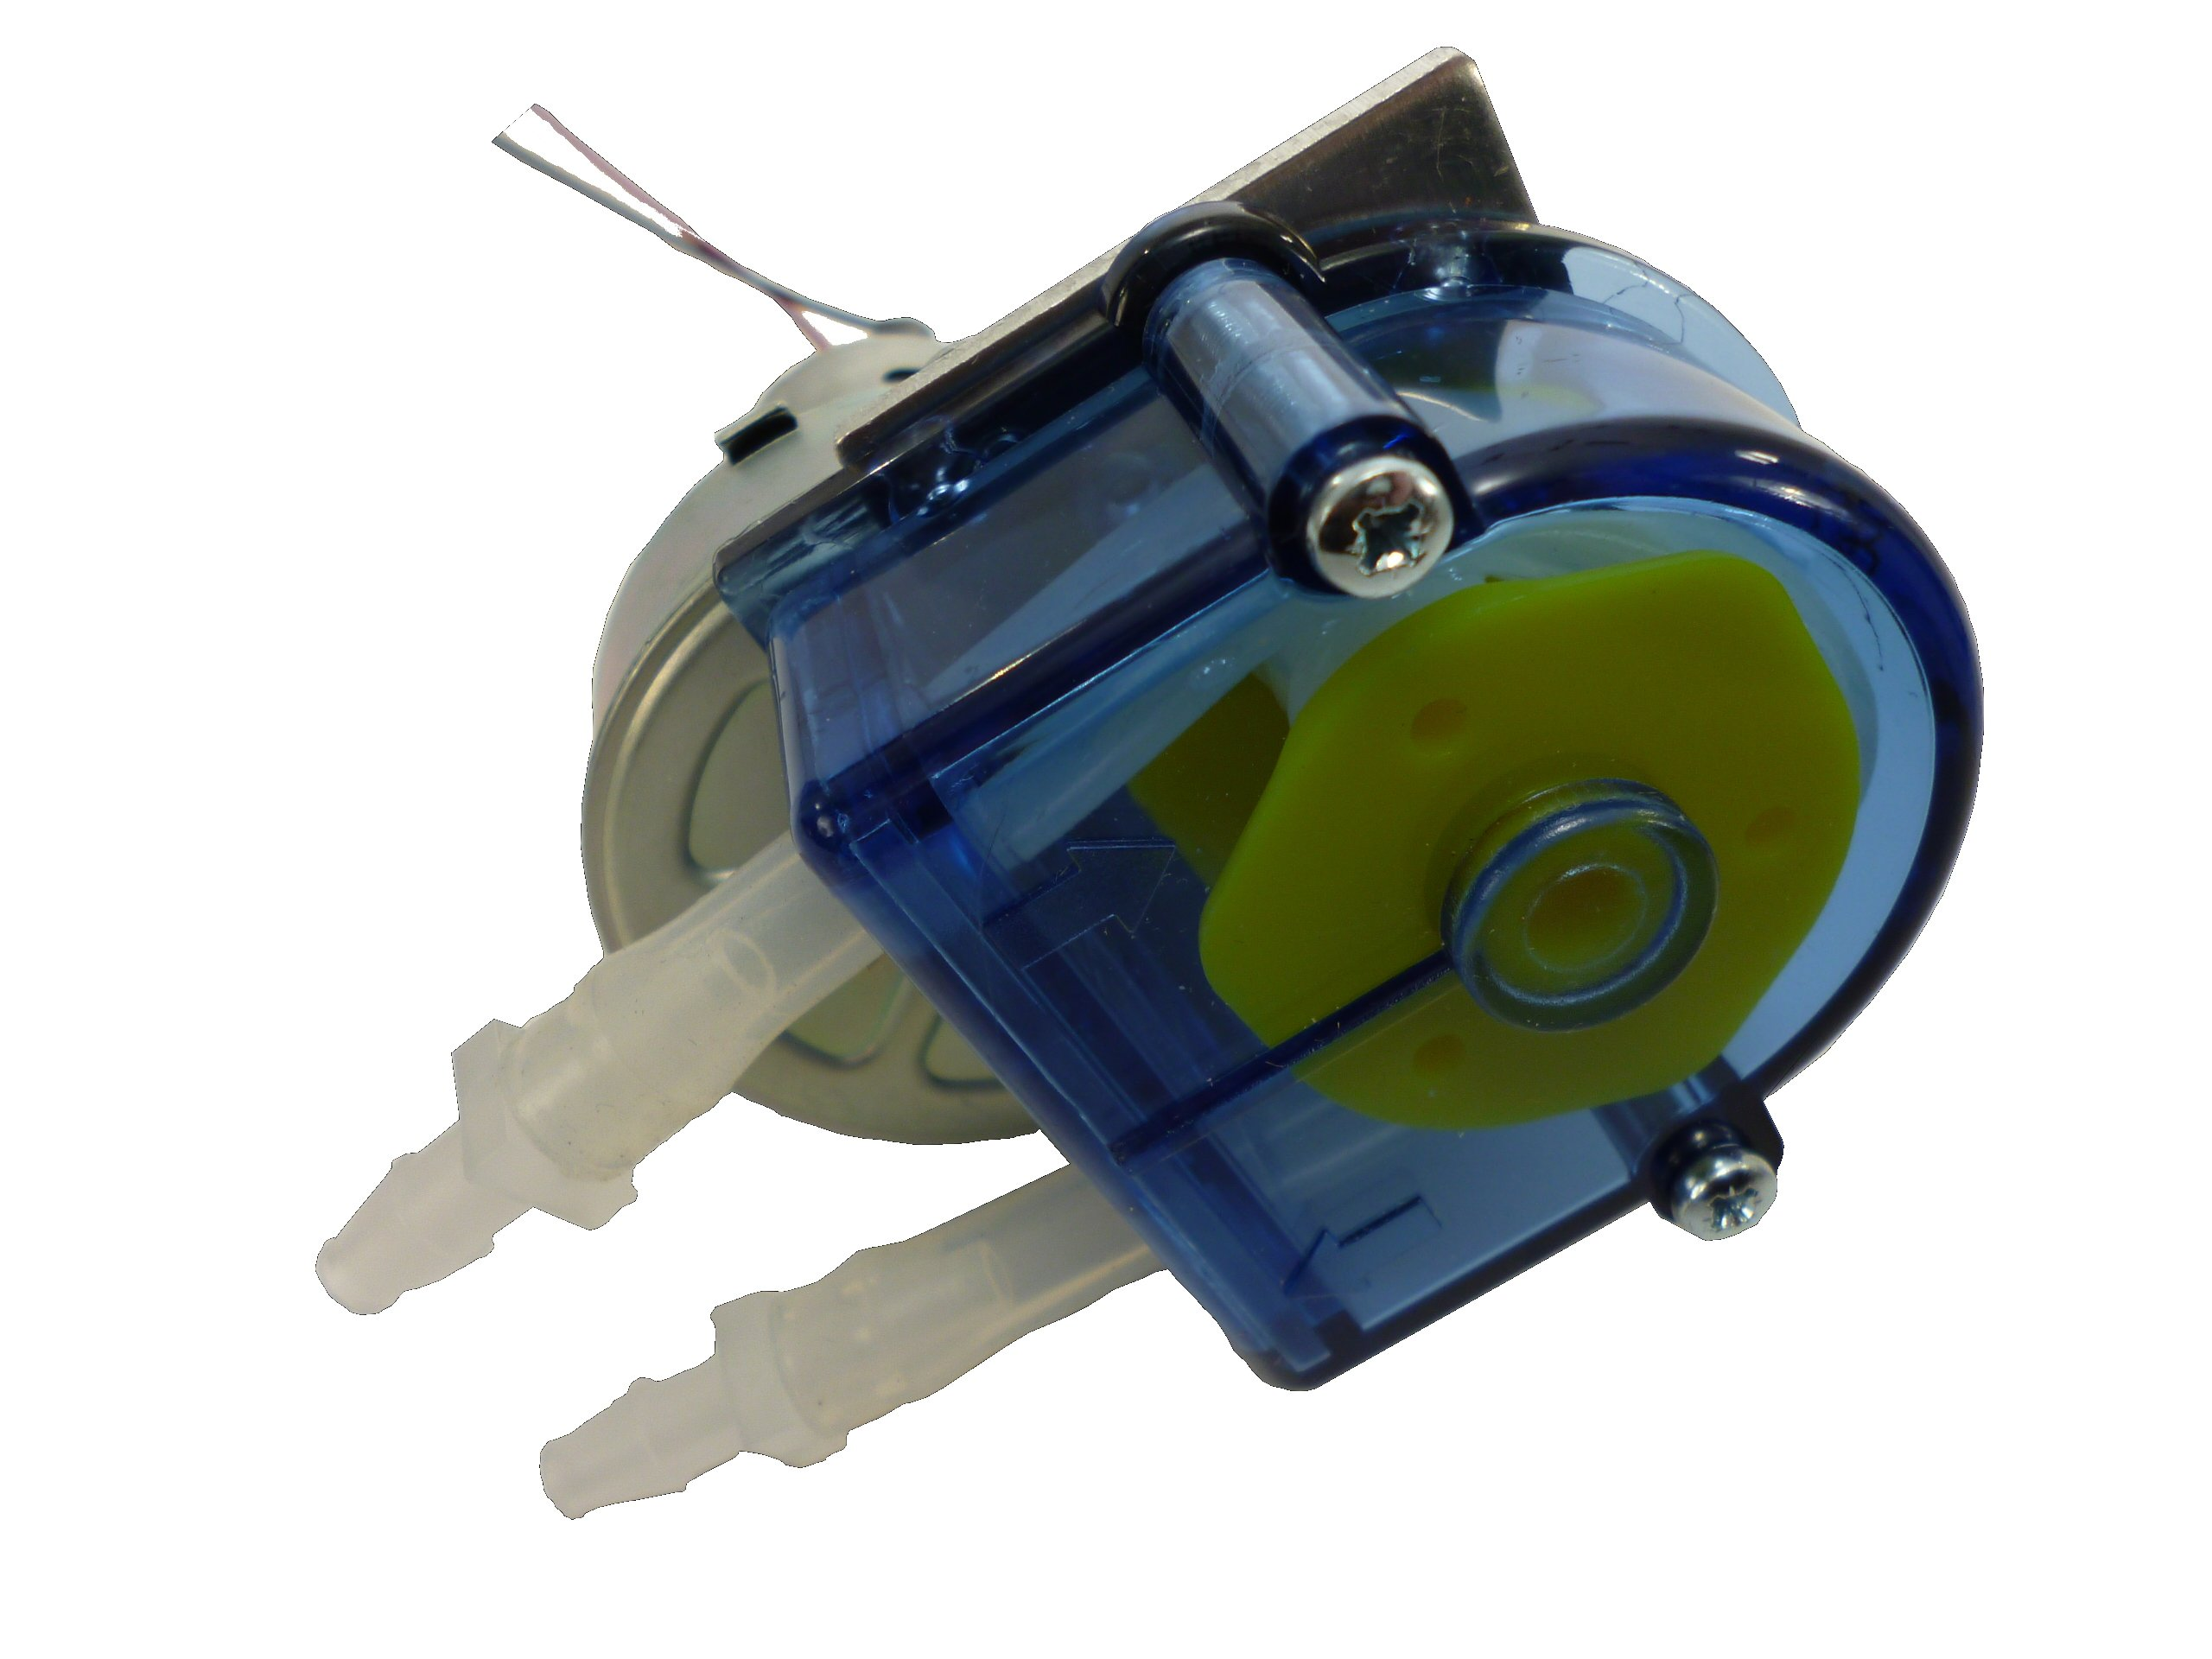 Simply Pumps PM200F Peristaltic Industrial Grade Self Priming Dosing Dispensing and Metering Pump with Norprene Food Grade Tubing, 12V DC, 300 mL/min